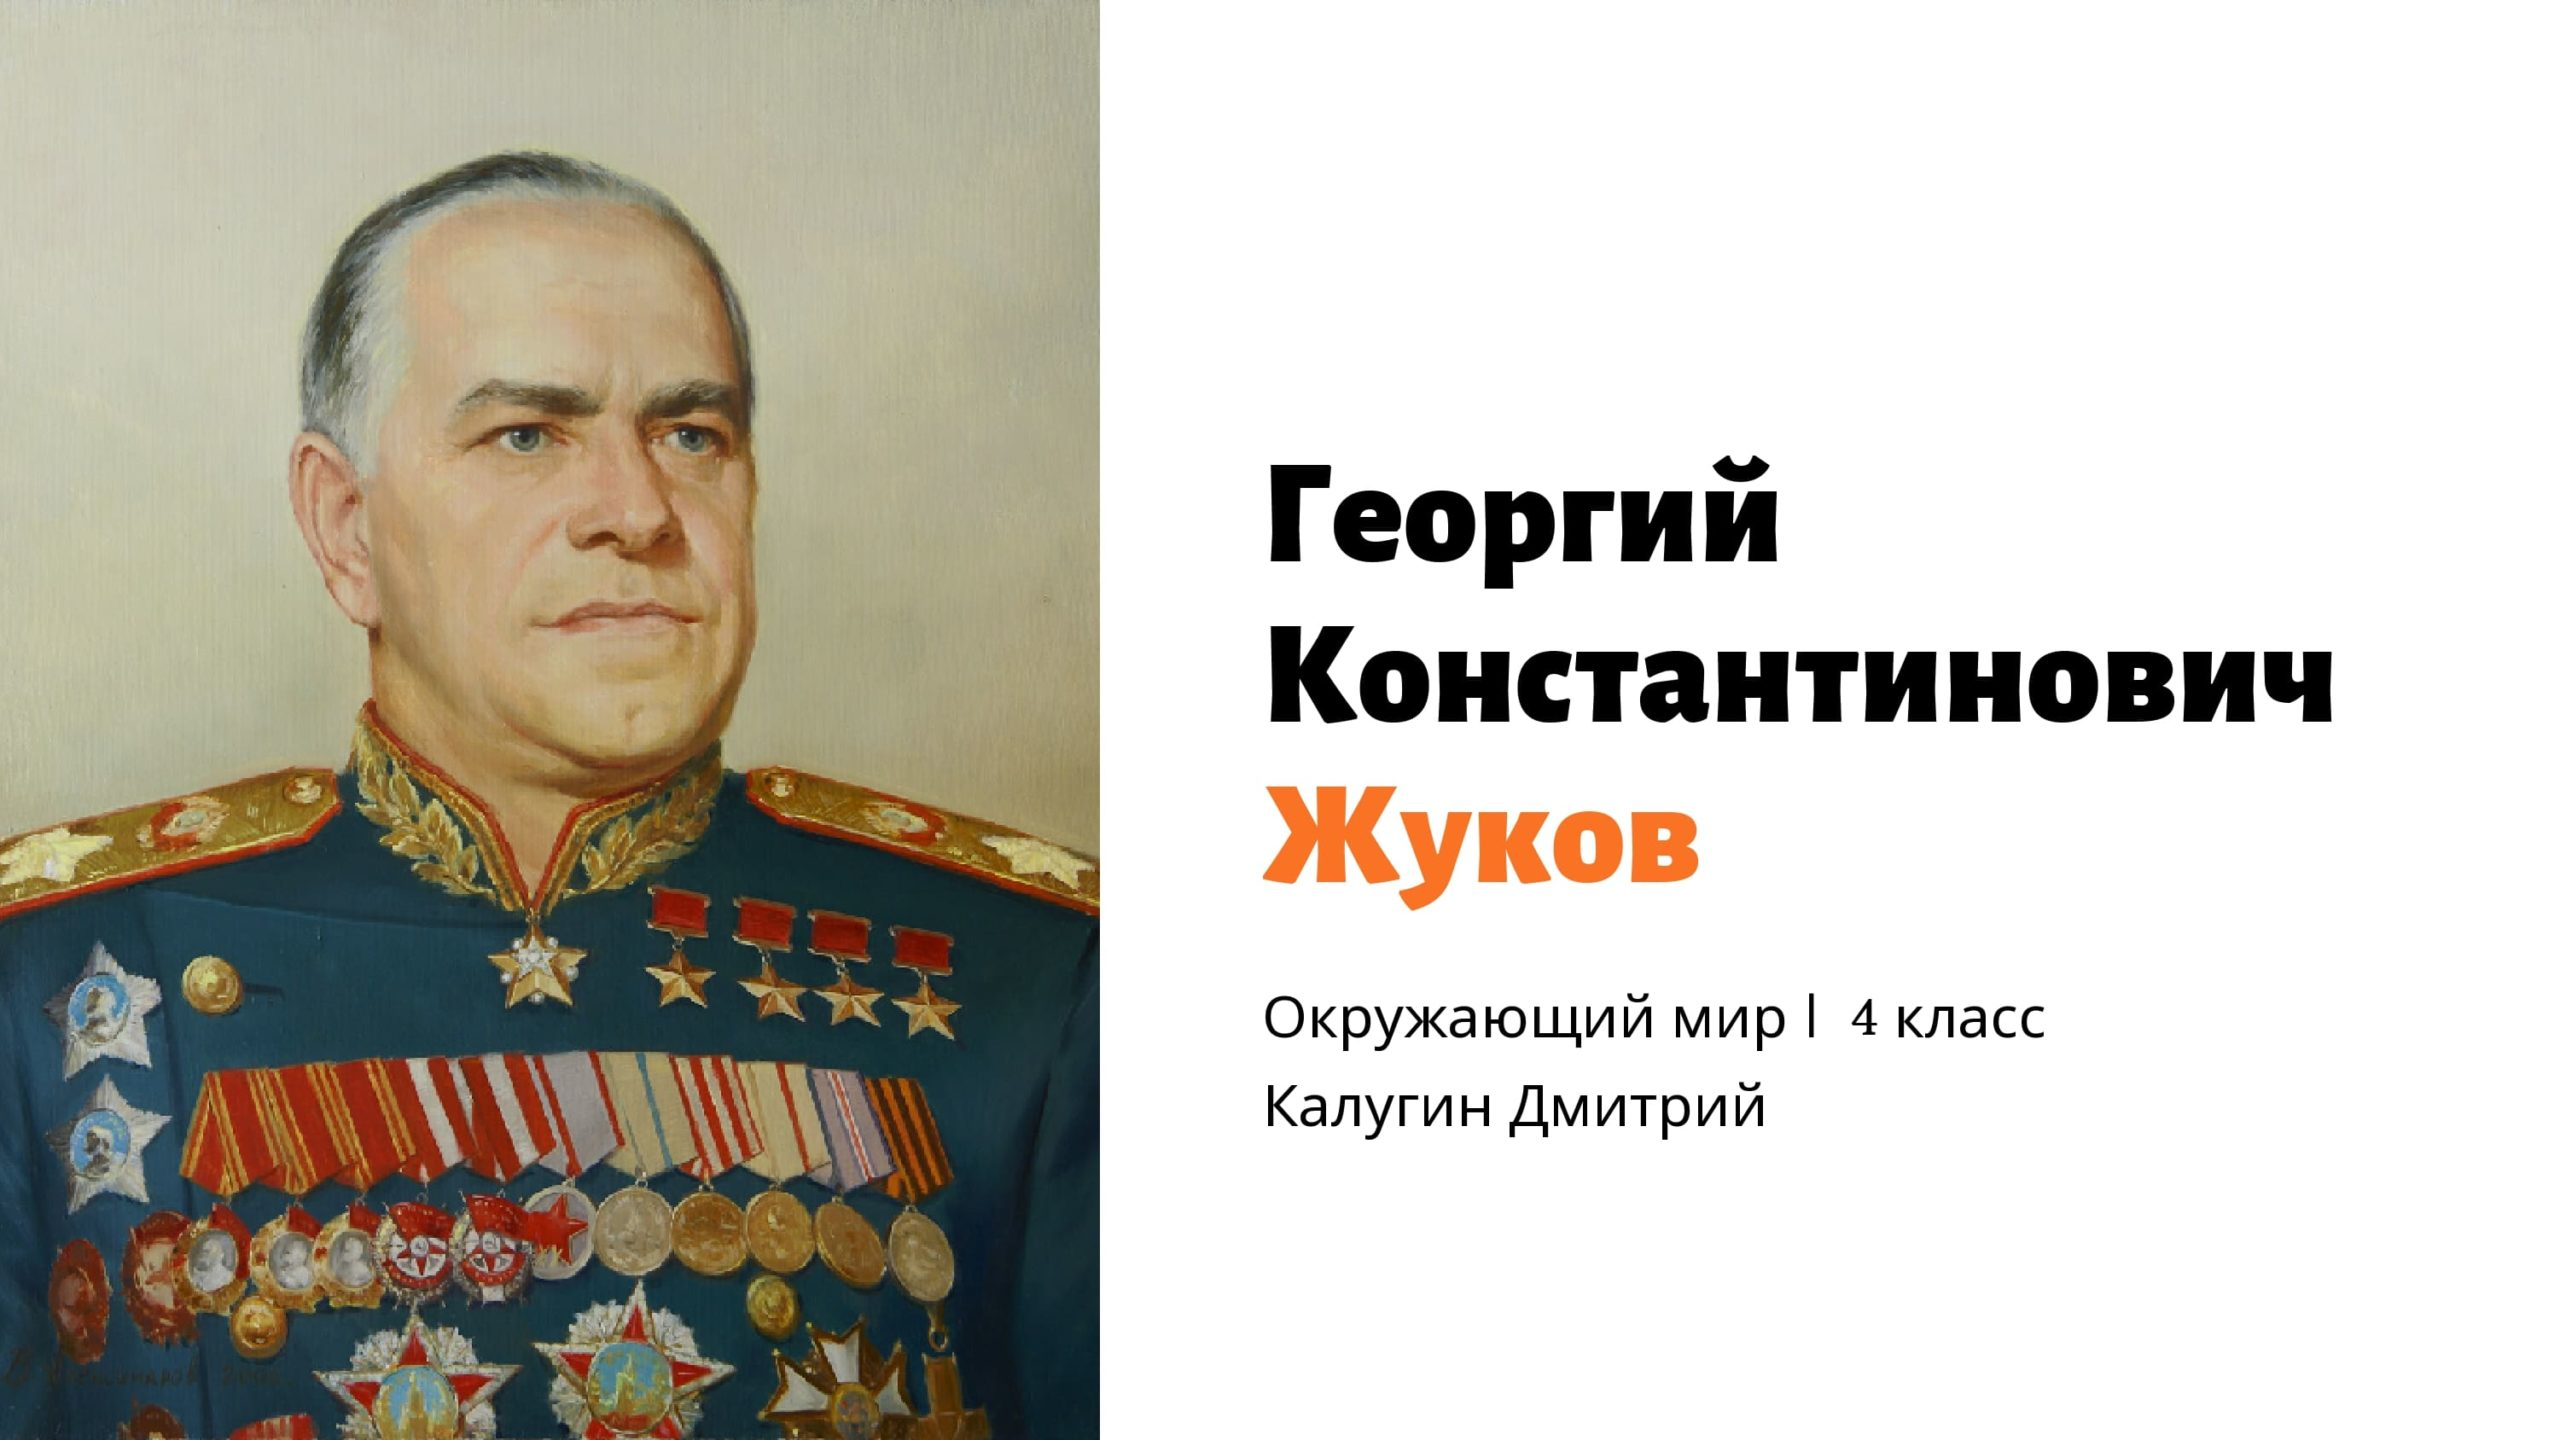 Георгий Константинович Жуков. Окружающий мир. 4 класс. Калугин Дмитрий